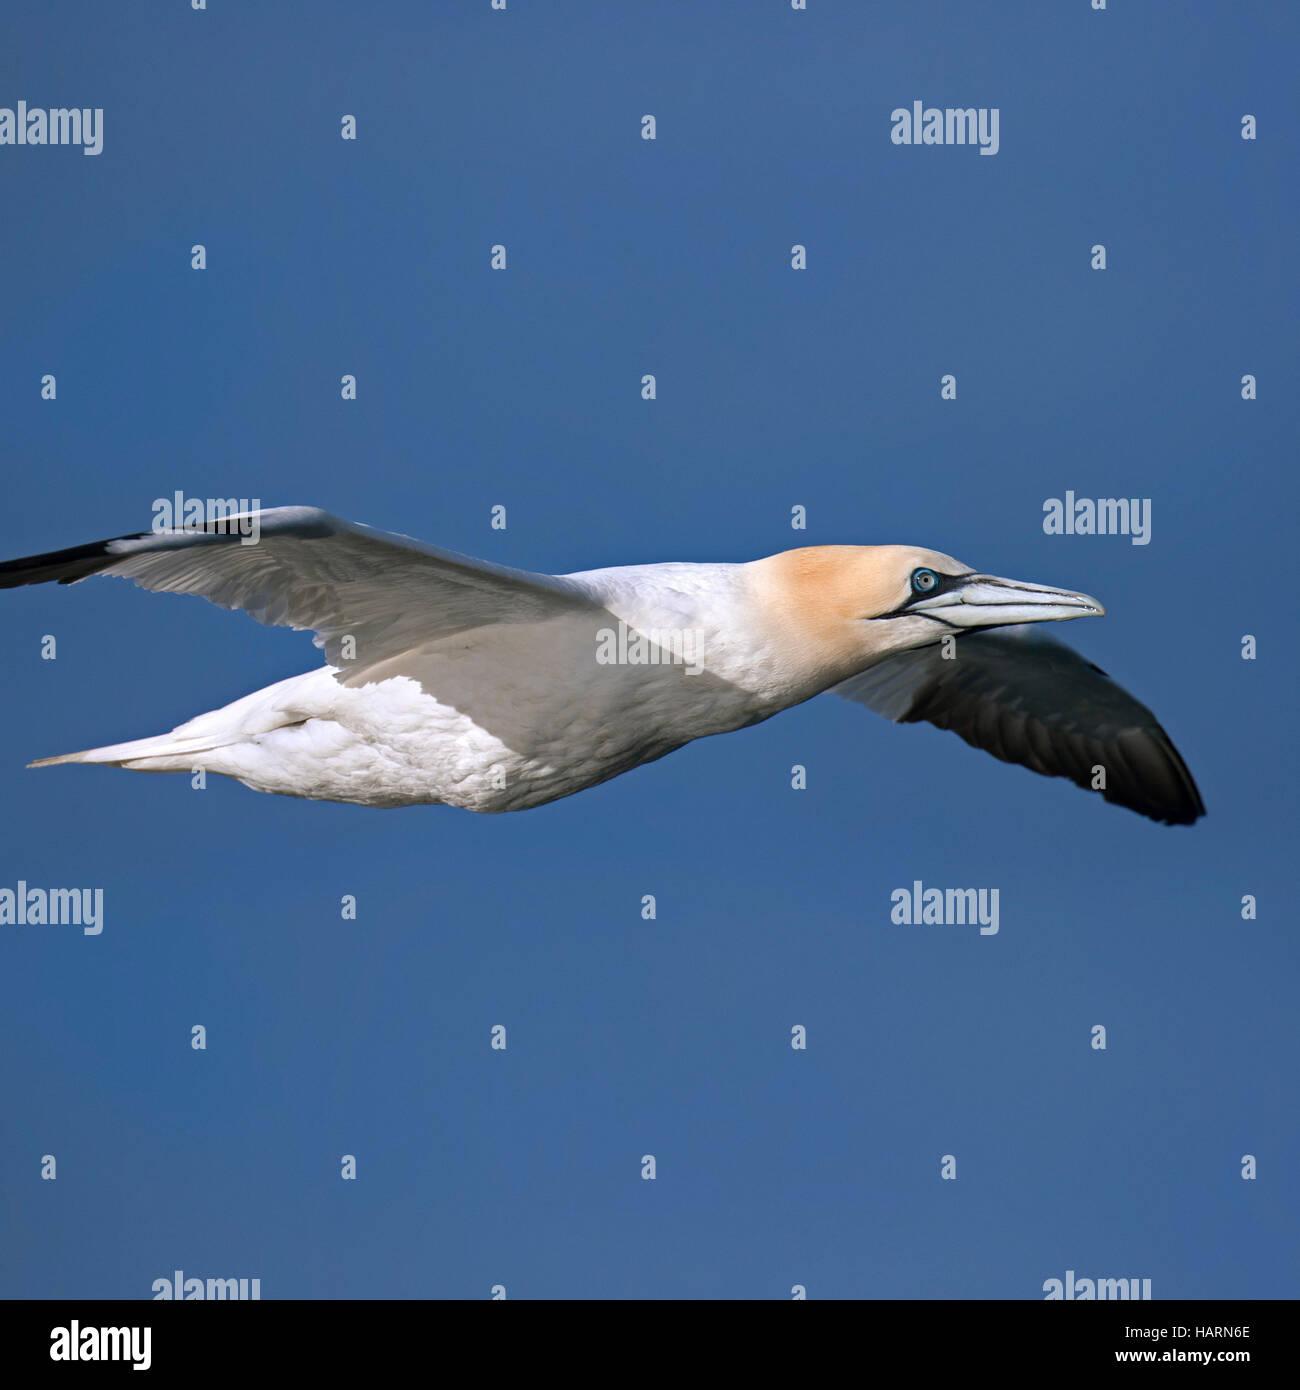 Close up of Northern gannet (Morus bassanus / Sula bassana) in flight against blue sky - Stock Image